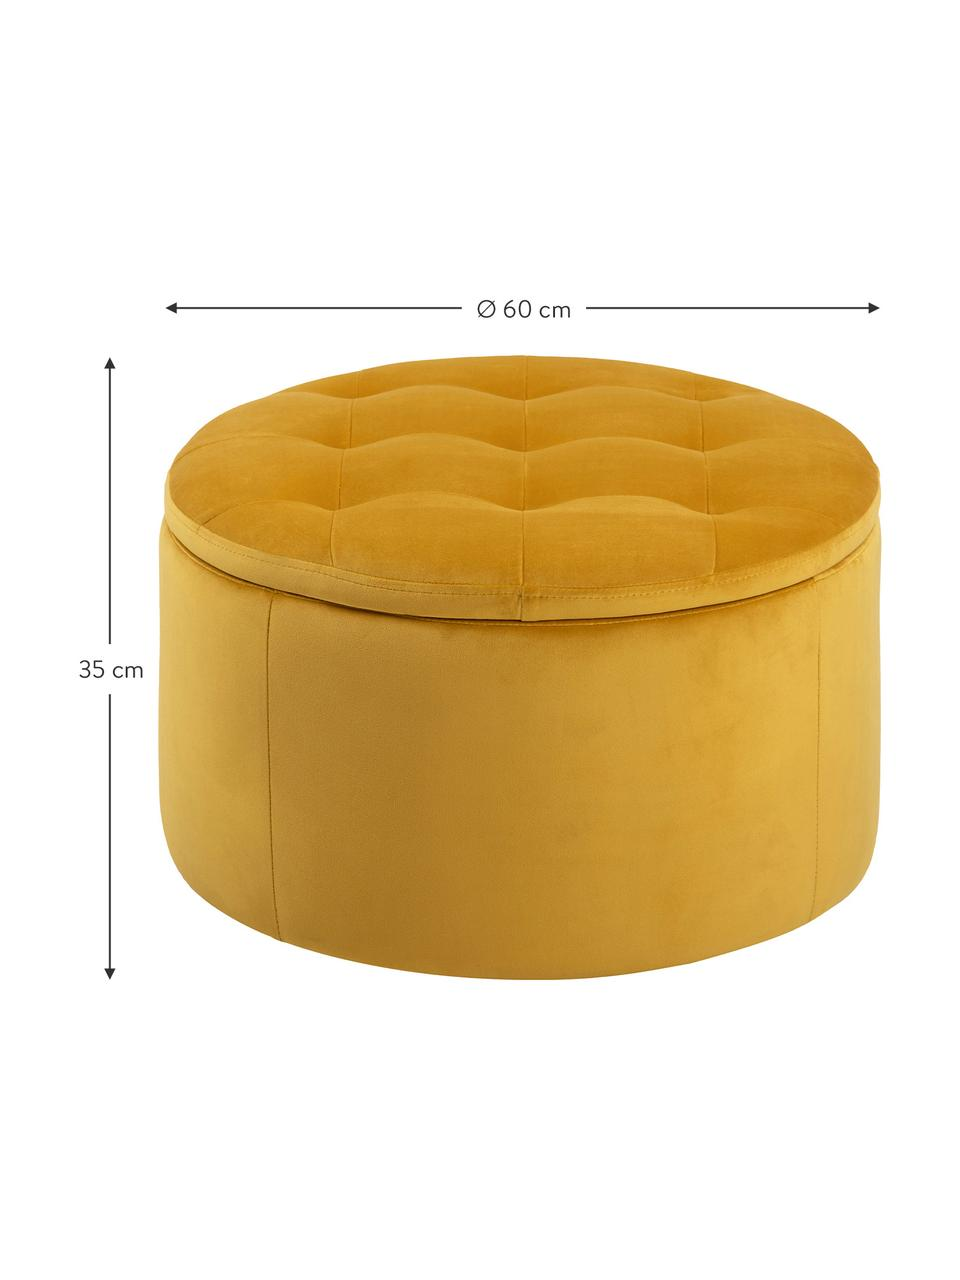 Fluwelen poef Retina met opbergruimte in geel, Bekleding: polyester fluweel 25.000 , Frame: kunststof, Geel, Ø 60 x H 35 cm